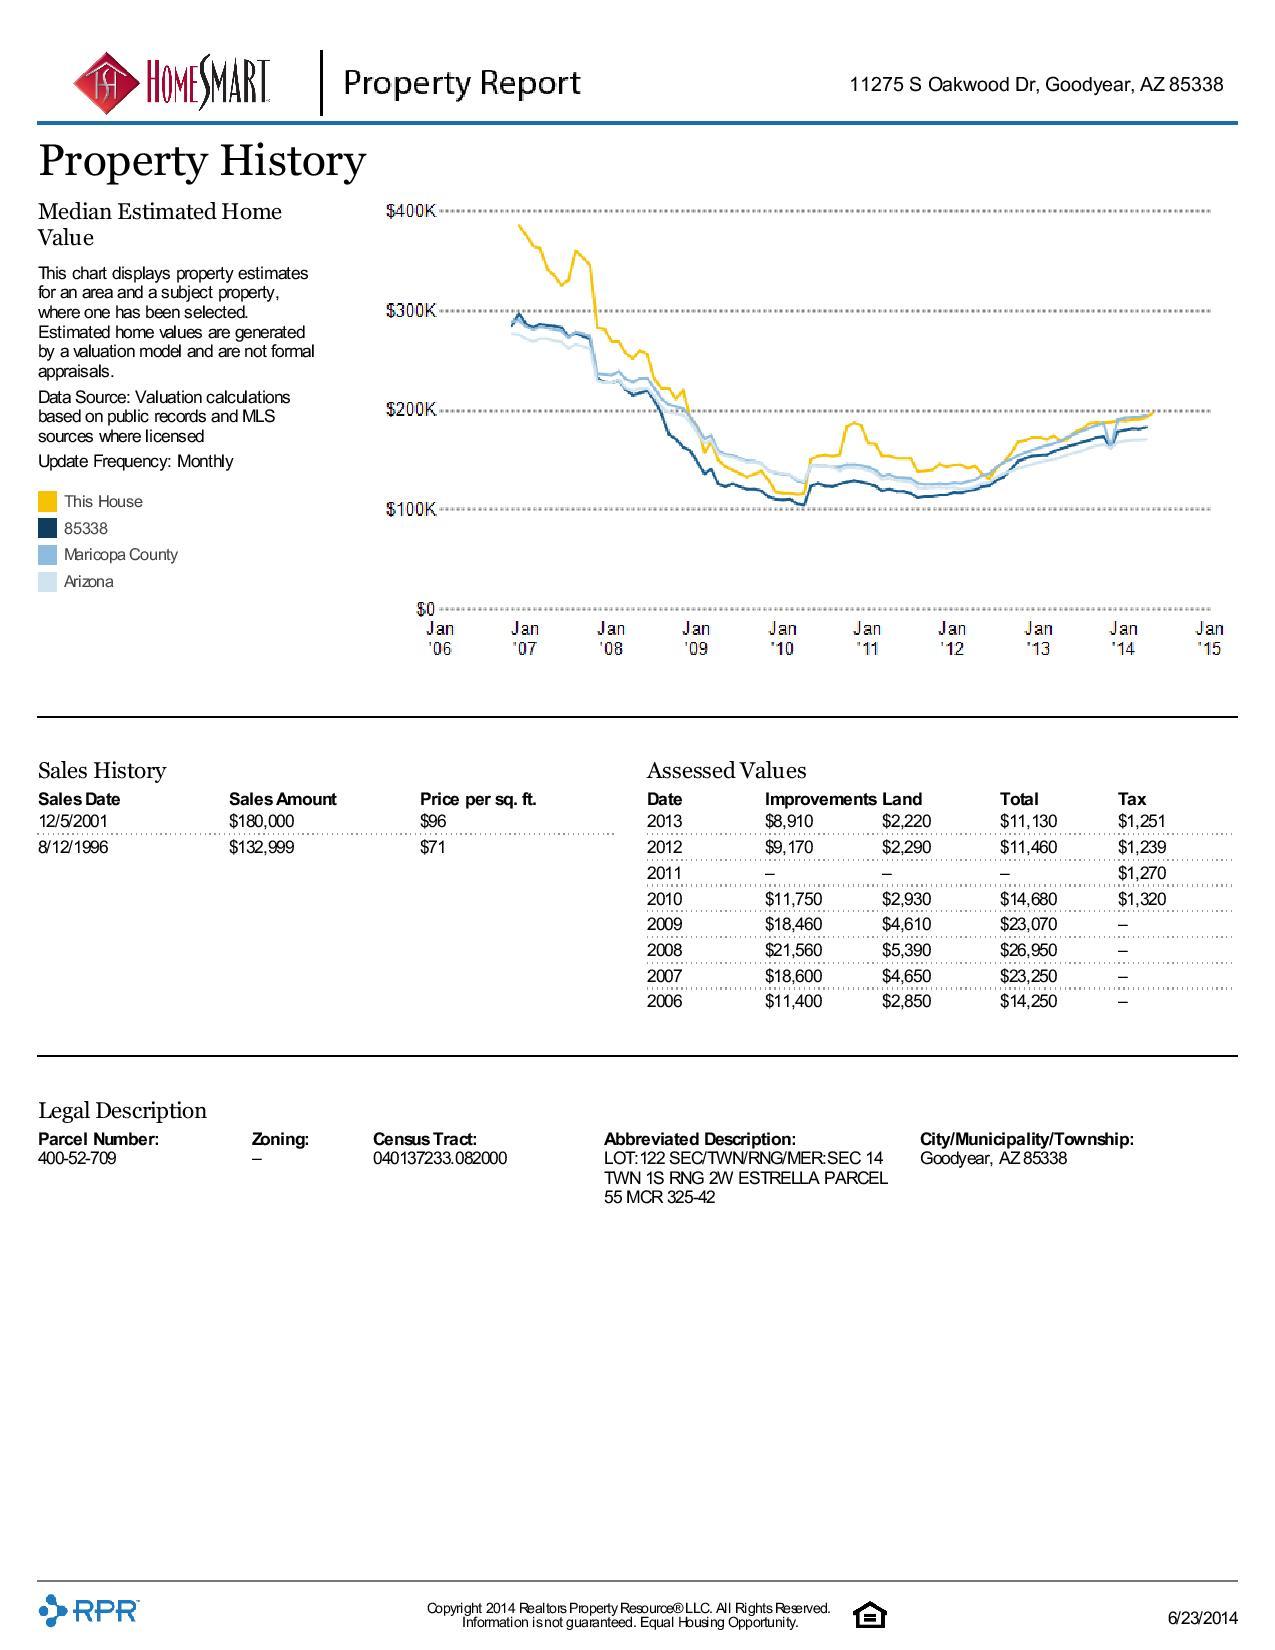 11275-S-Oakwood-Dr-Goodyear-AZ-85338-page-007